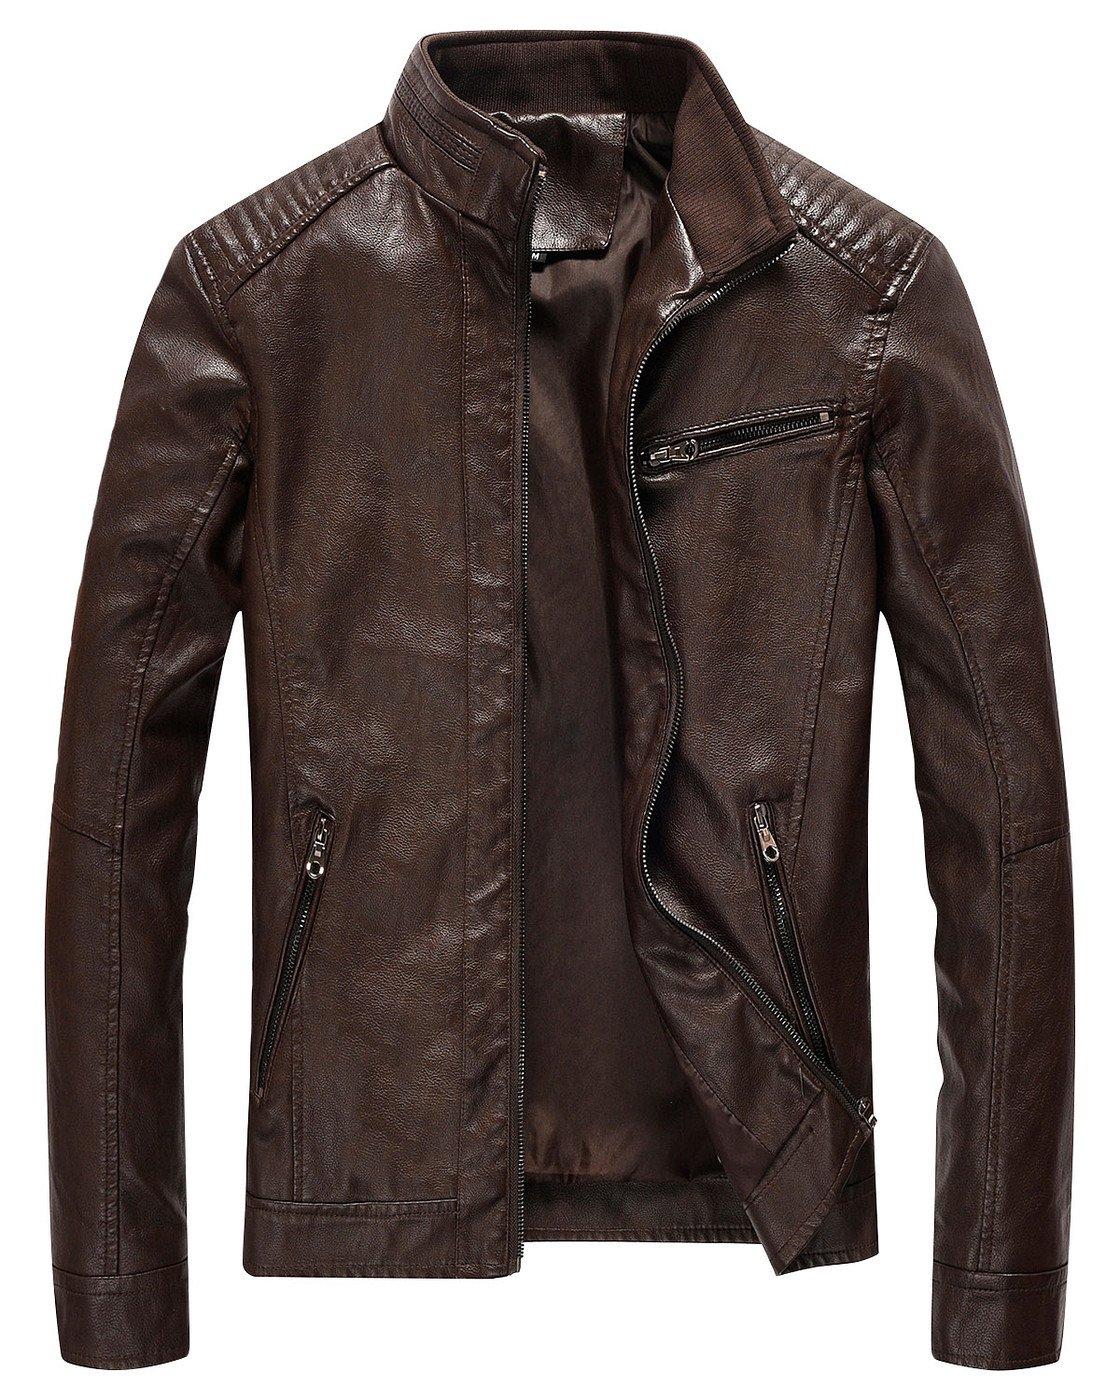 Fairylinks Leather Jacket Men Lightweight Bomber Jackets and Coats, Deep Brown